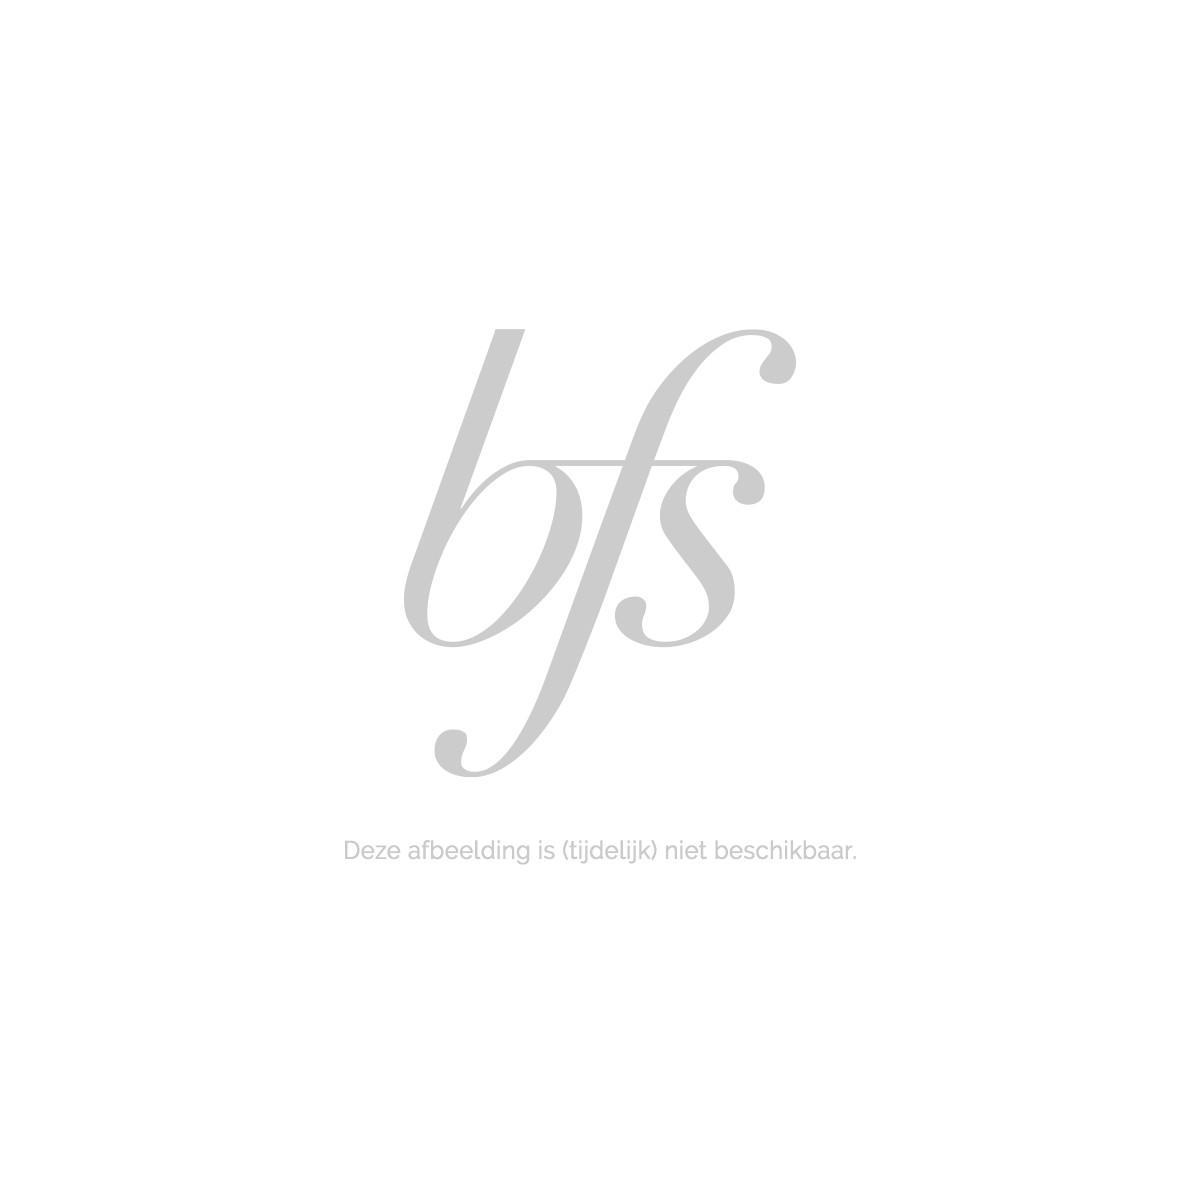 Anastasia Brush #12 Dual-Ended Firm Angled Brush